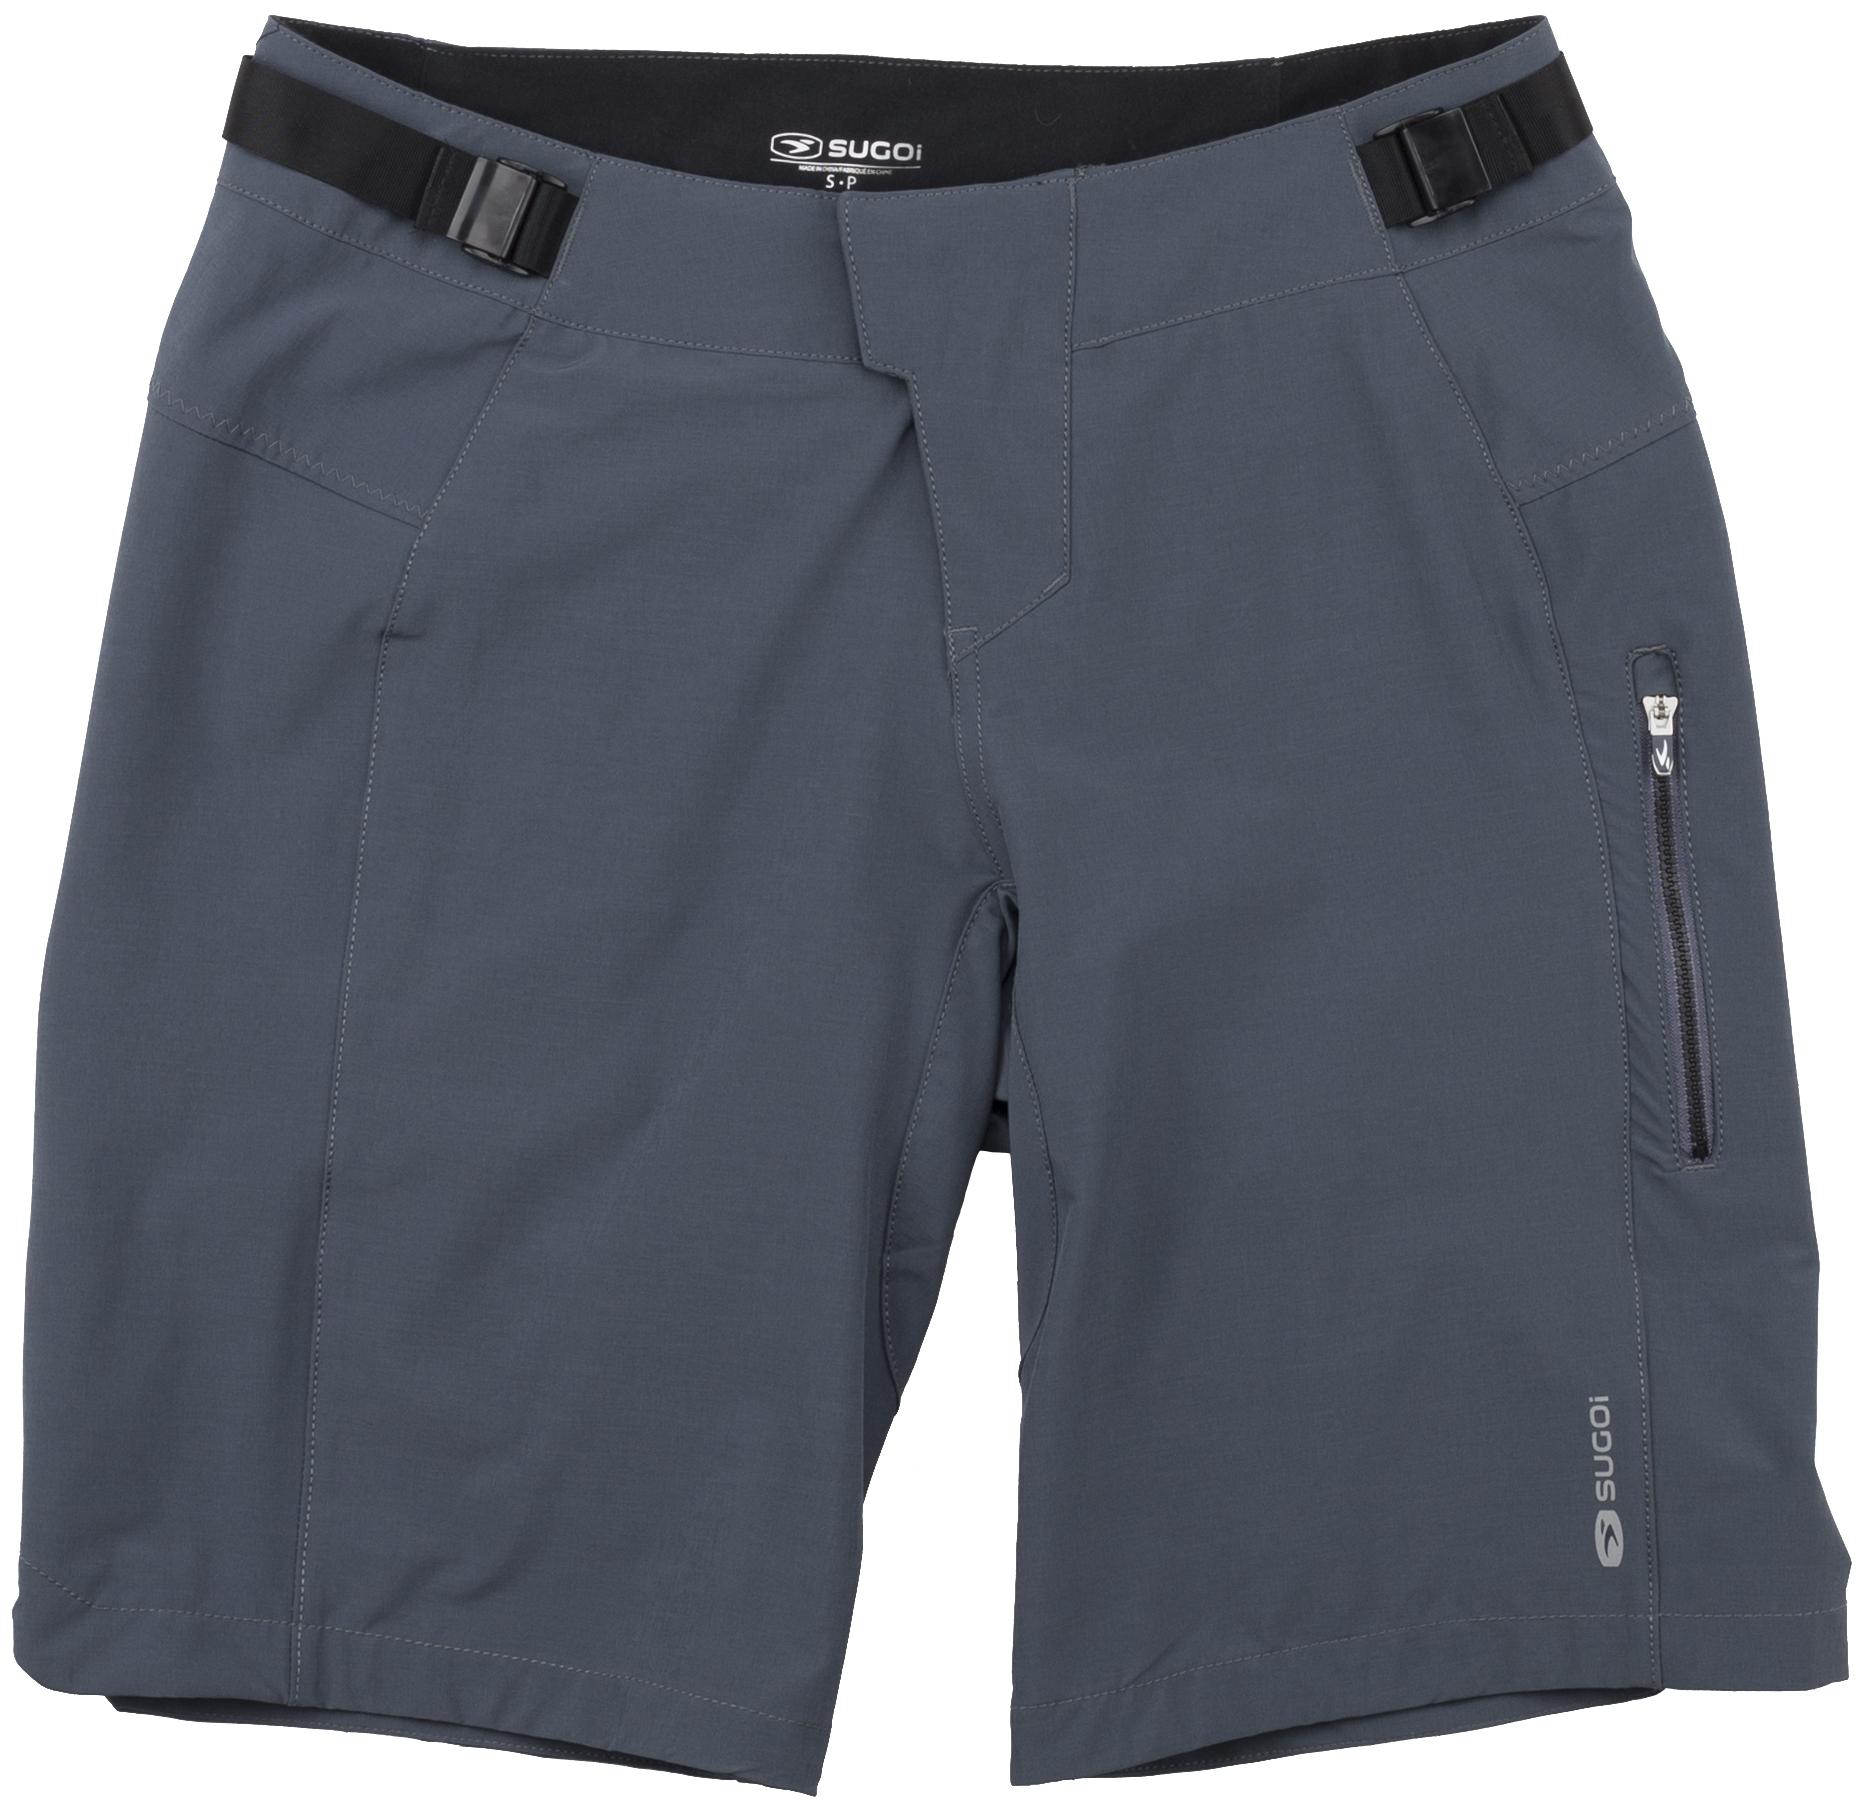 ... Trail Bike Shorts.    Women s Shorts · Sugoi bf8bd0638